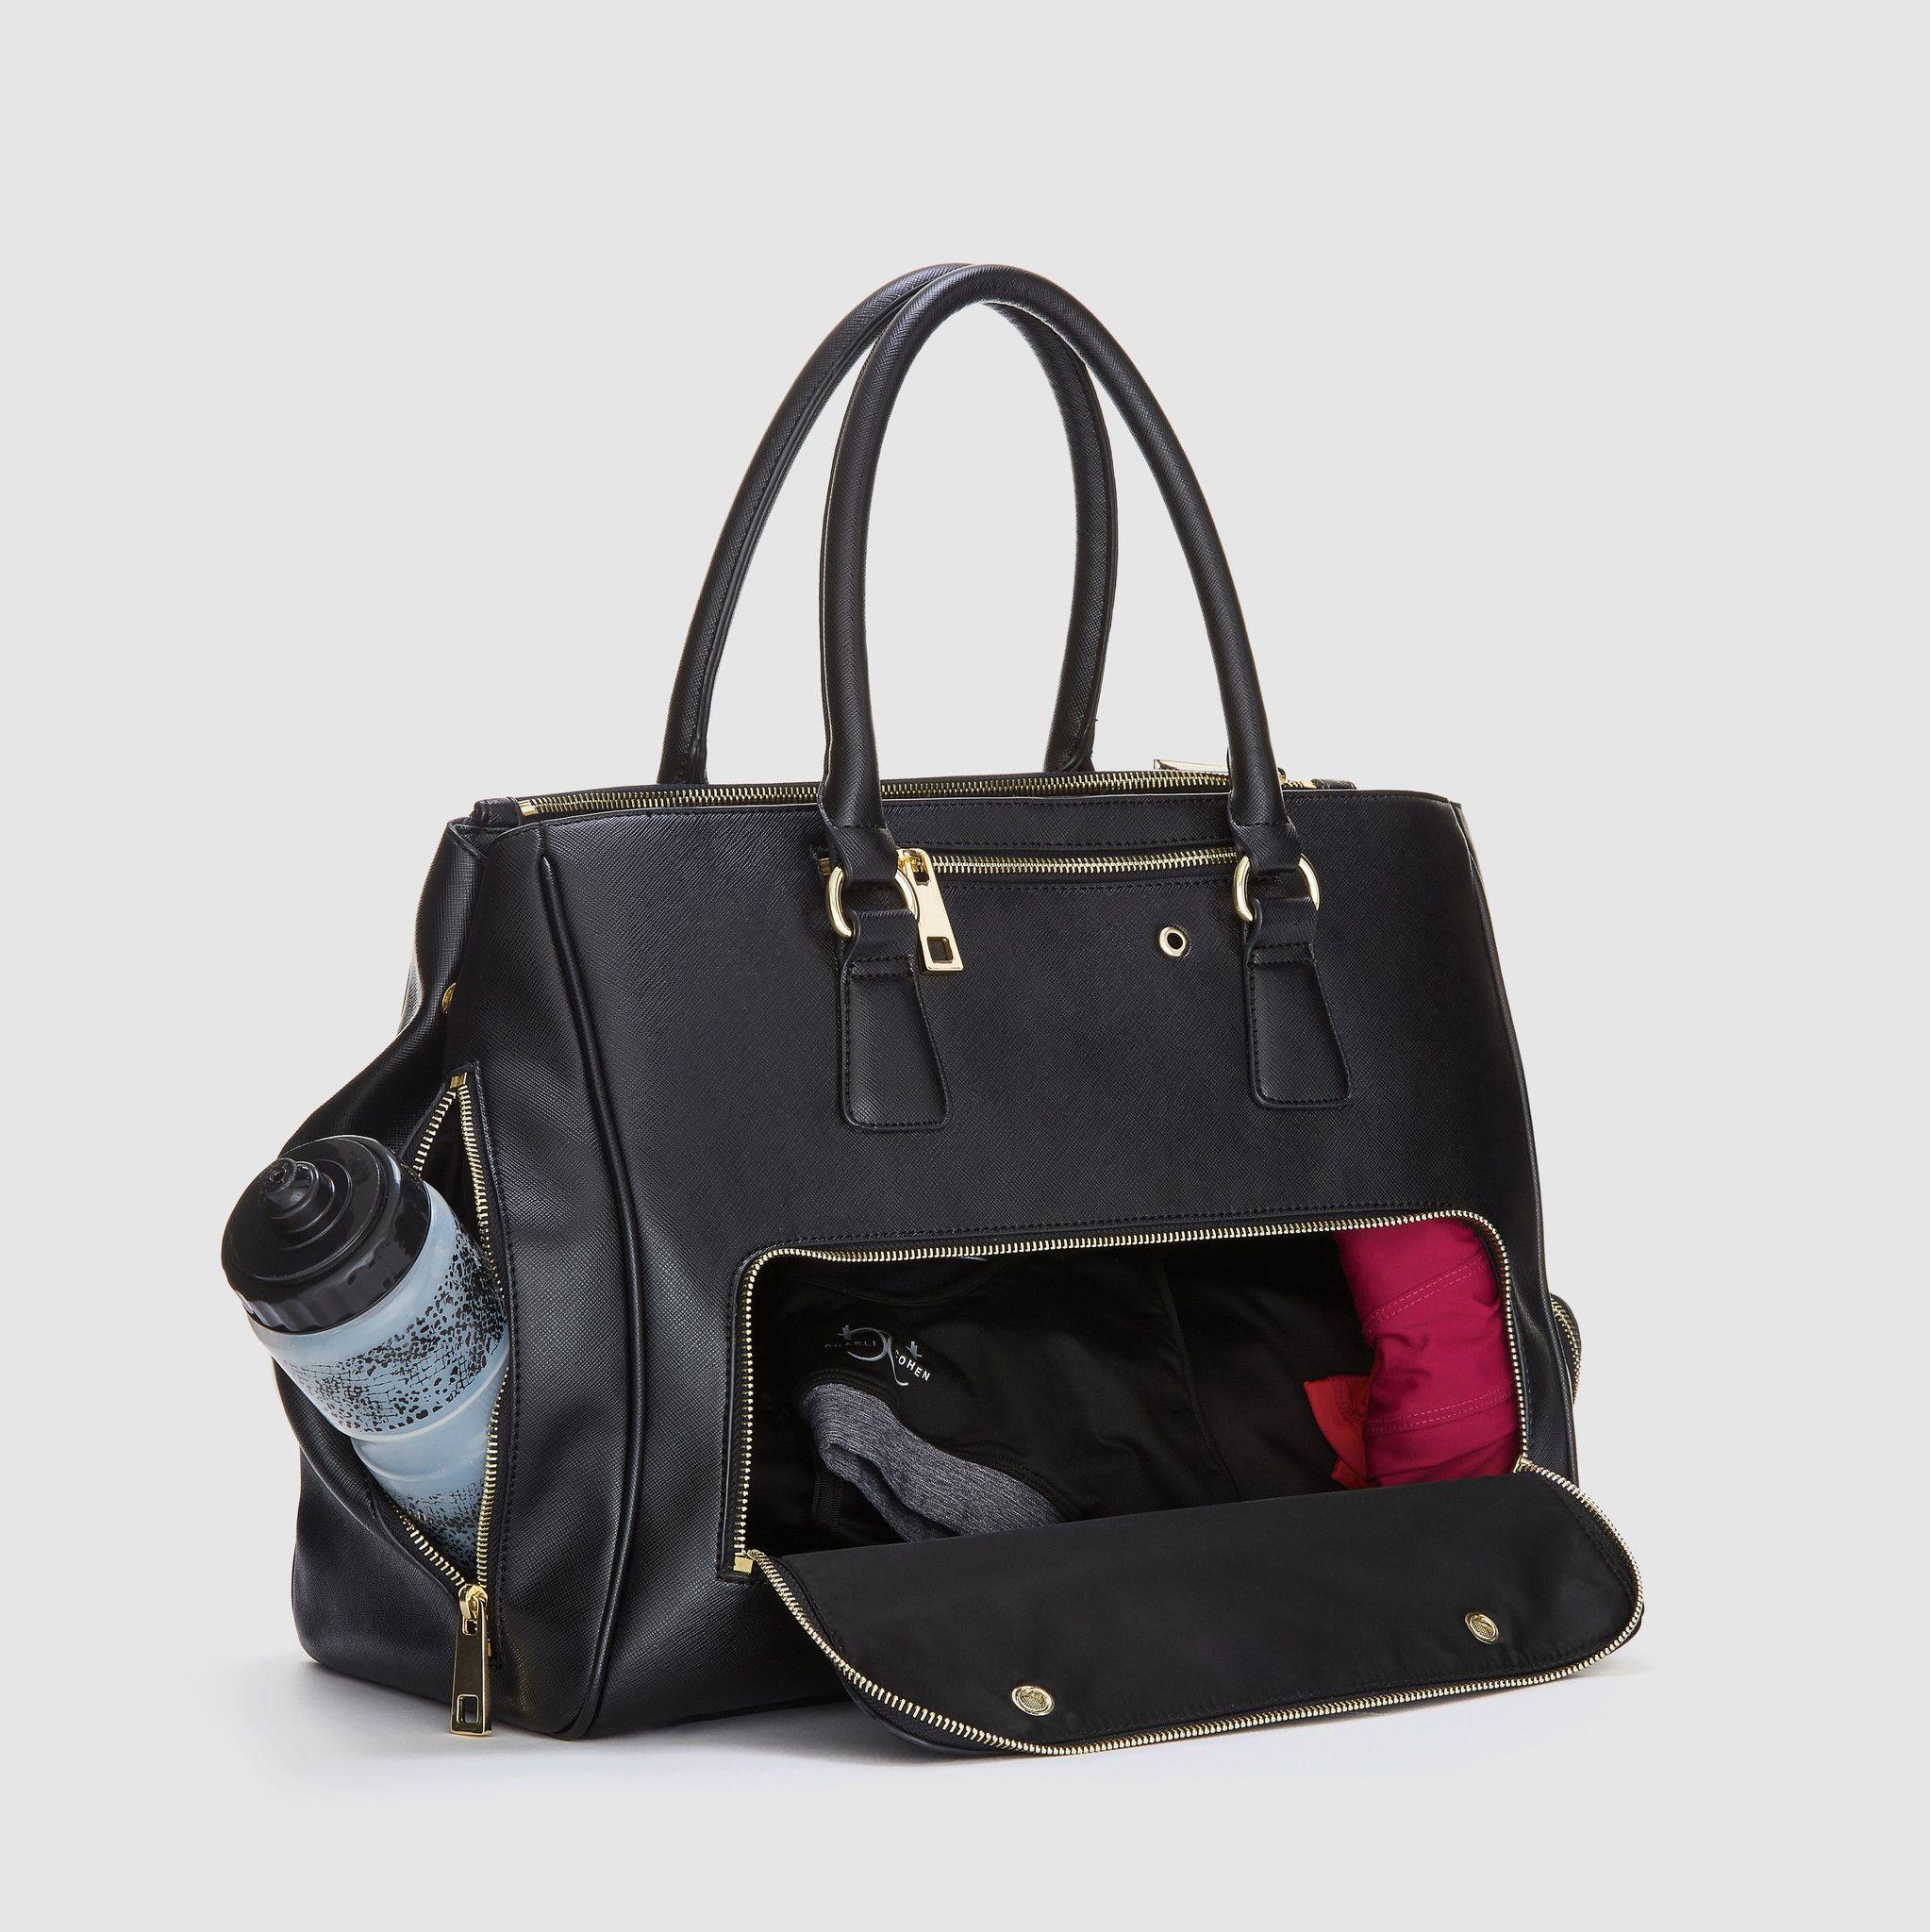 1e4ab8e40 Sophia Tote Black in 2019 | Professional Looks | Black tote bag ...